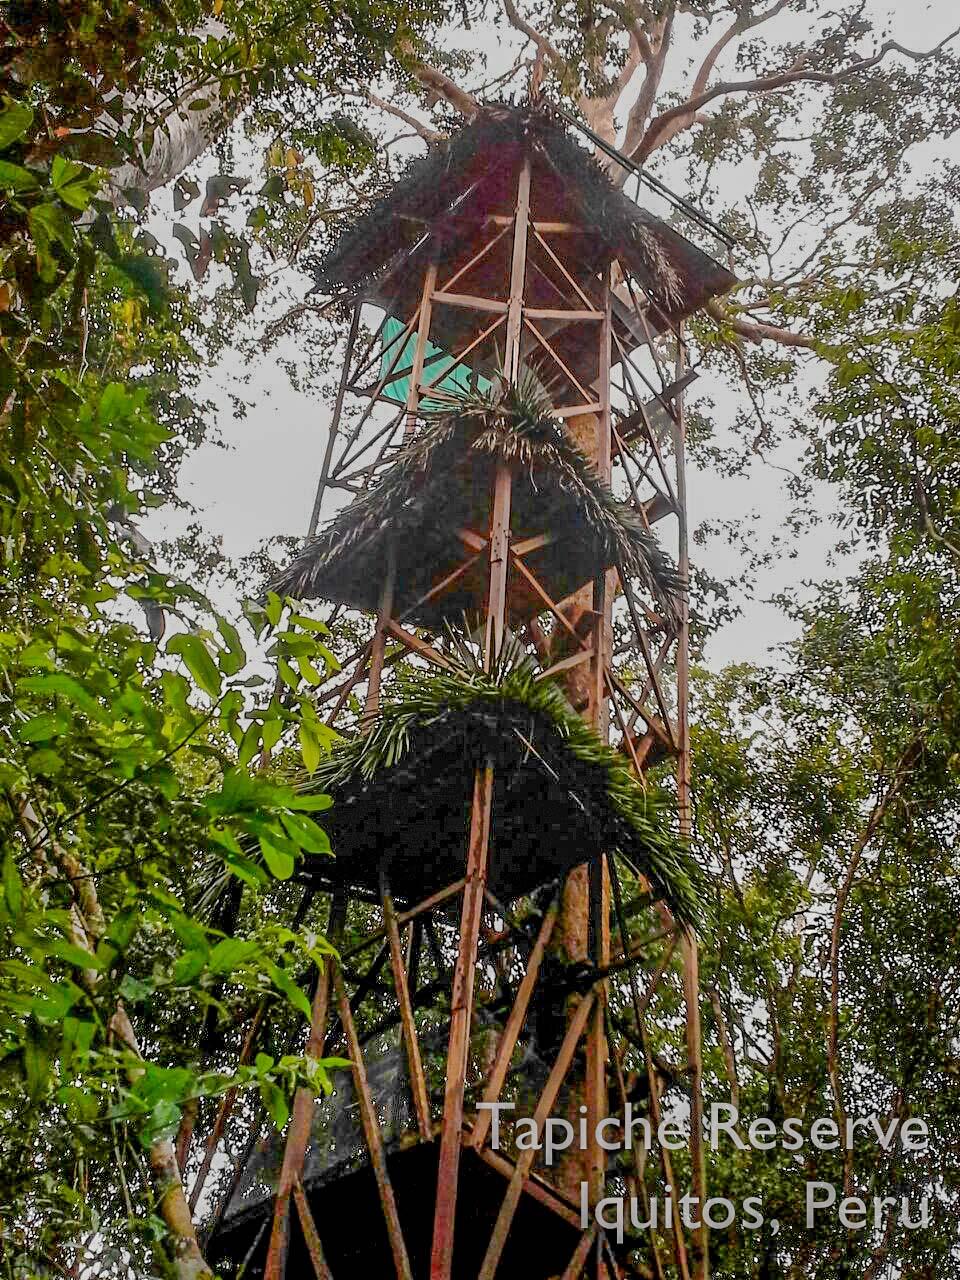 Tapiche-Amazon-Jungle-Tour-Peru-canopy-observation-tower-7.jpg